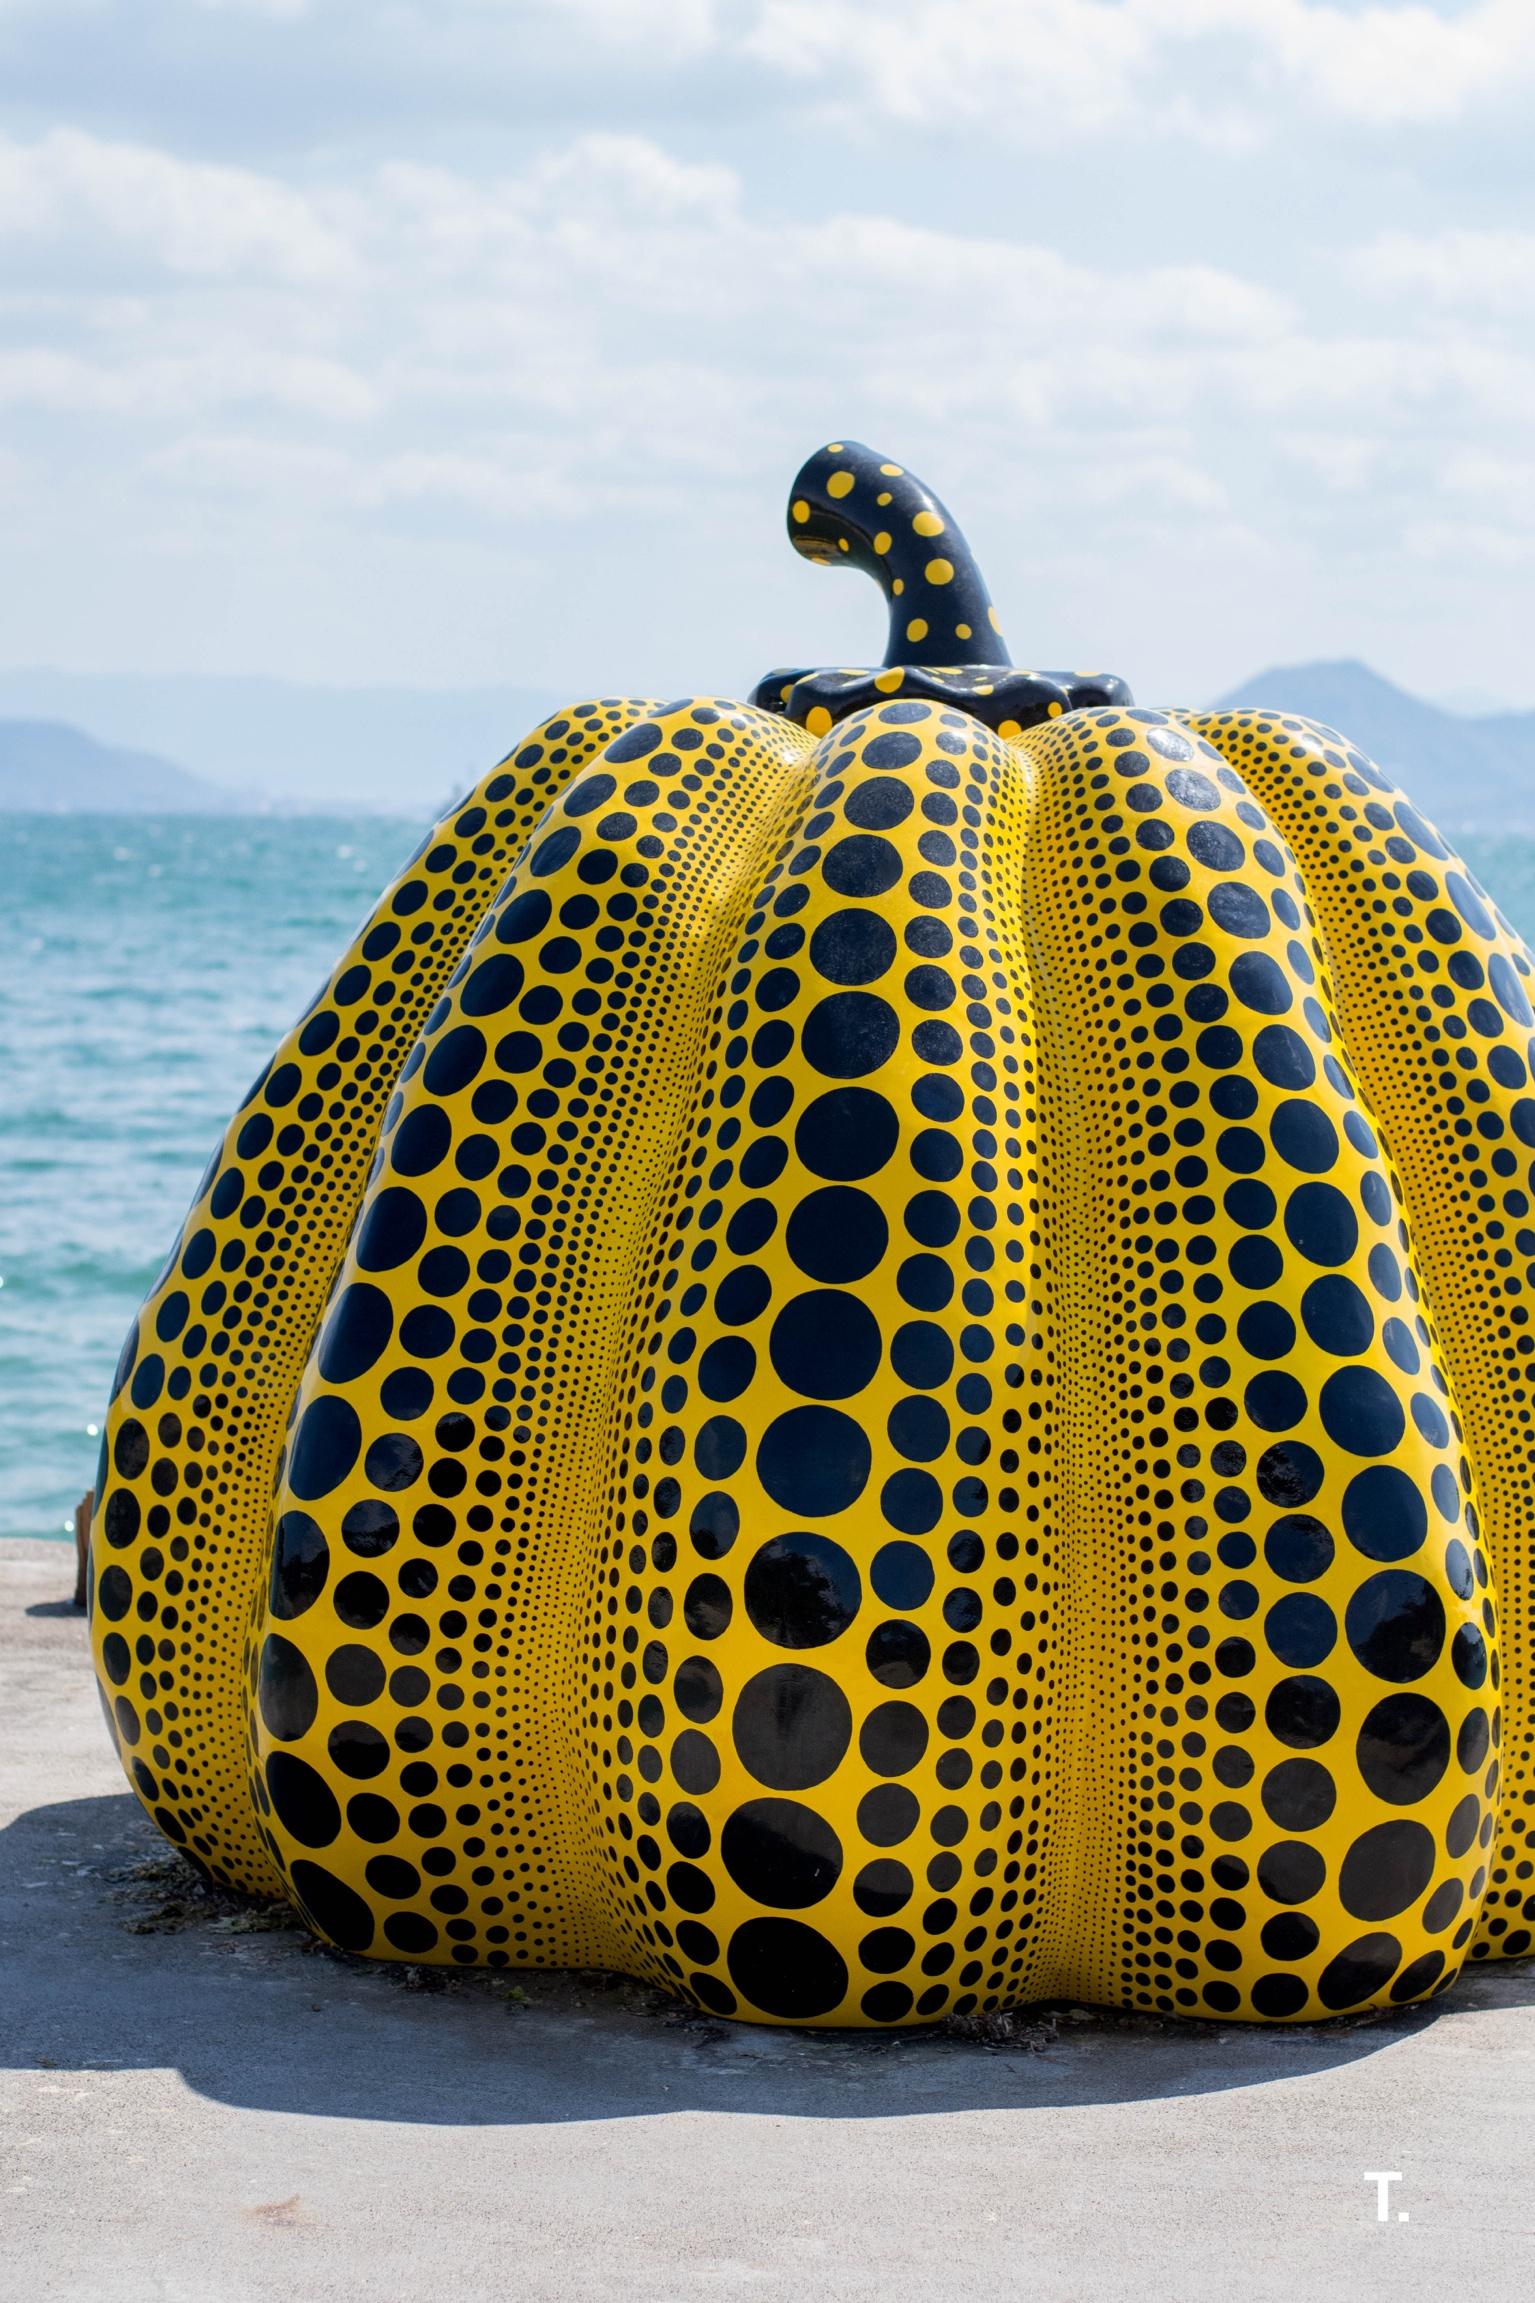 Yayoi Kusama's Yellow Pumpkin on Naoshima